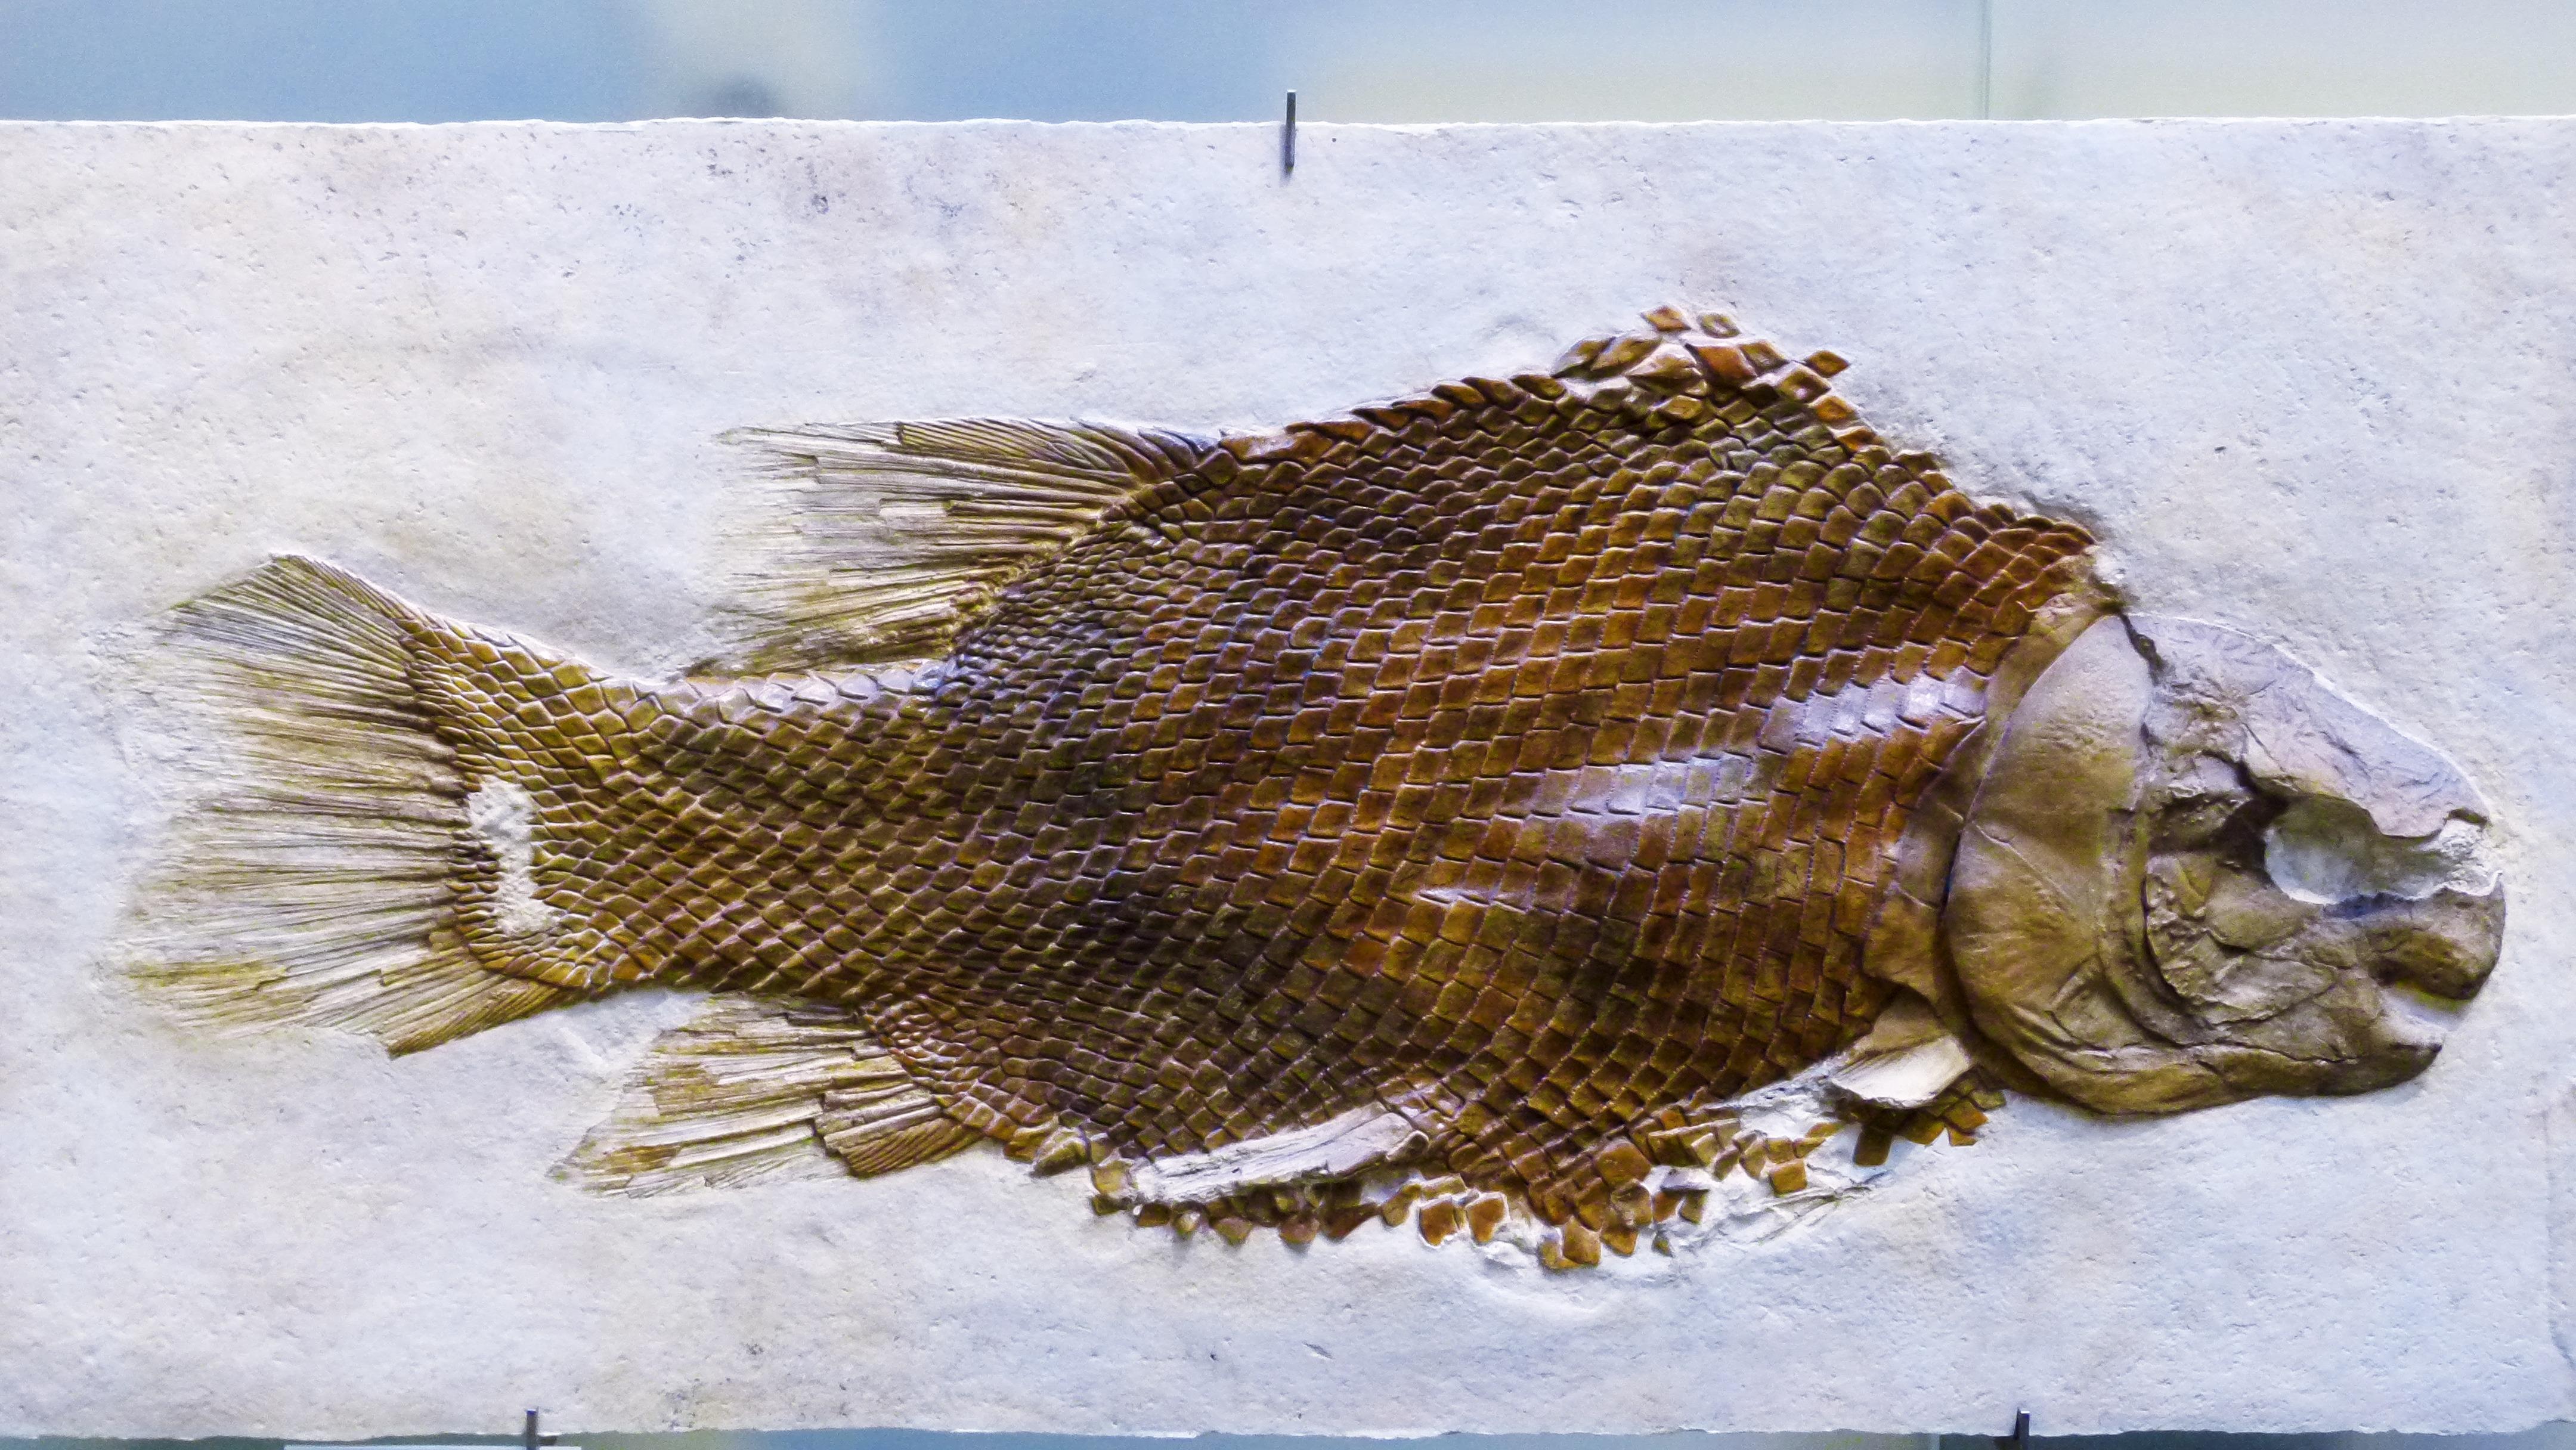 Gambar Ikan Fauna Tulang Patung Seni Kerangka Fosil